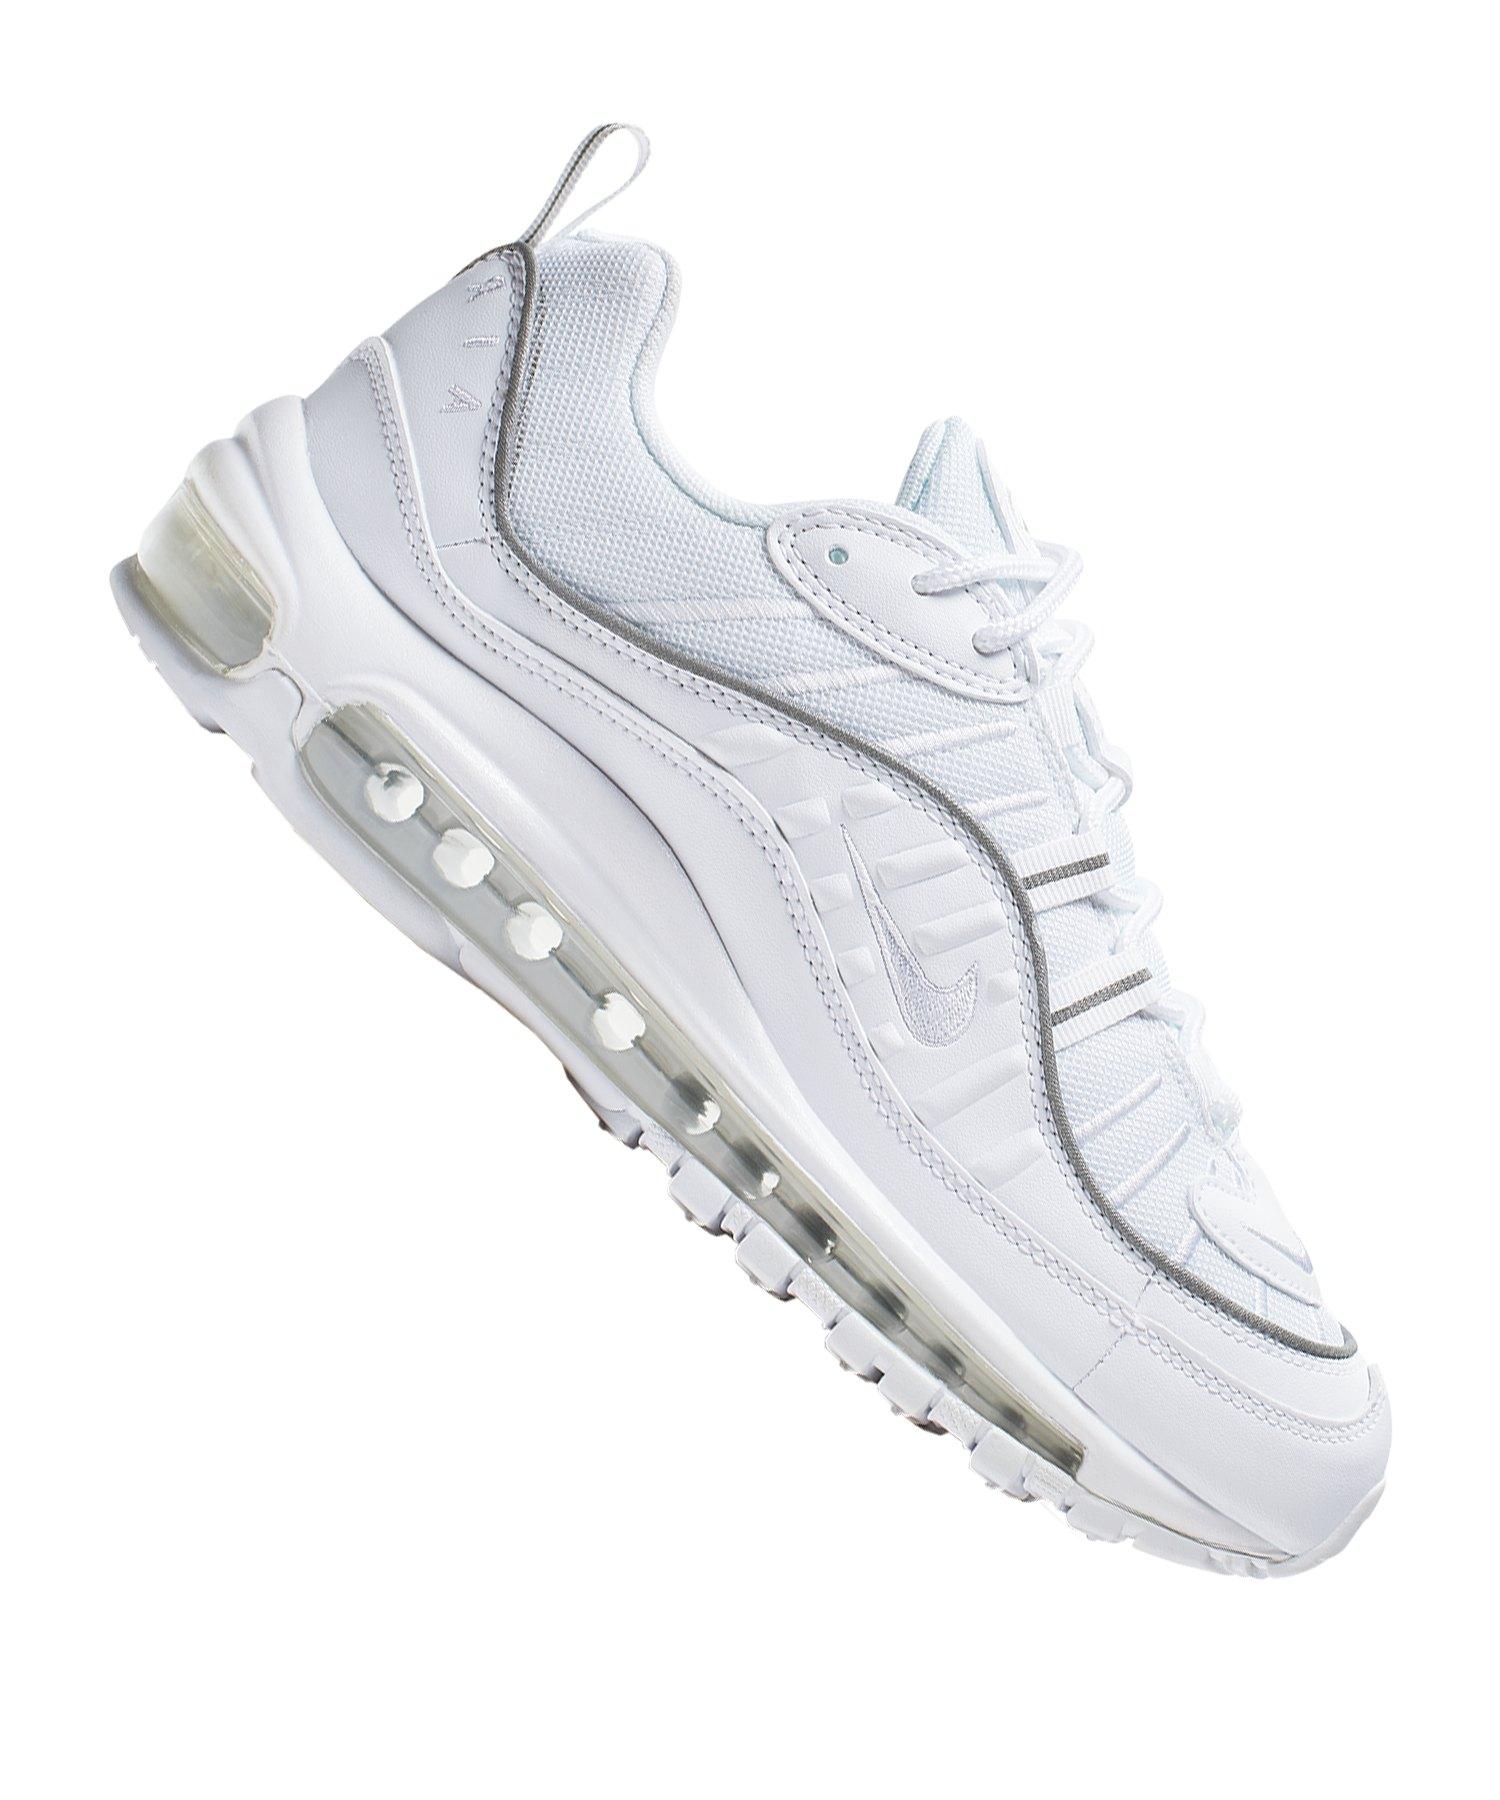 Nike Damen Air Max 95 Lifestyle Schuhe Schwarz Reflektor